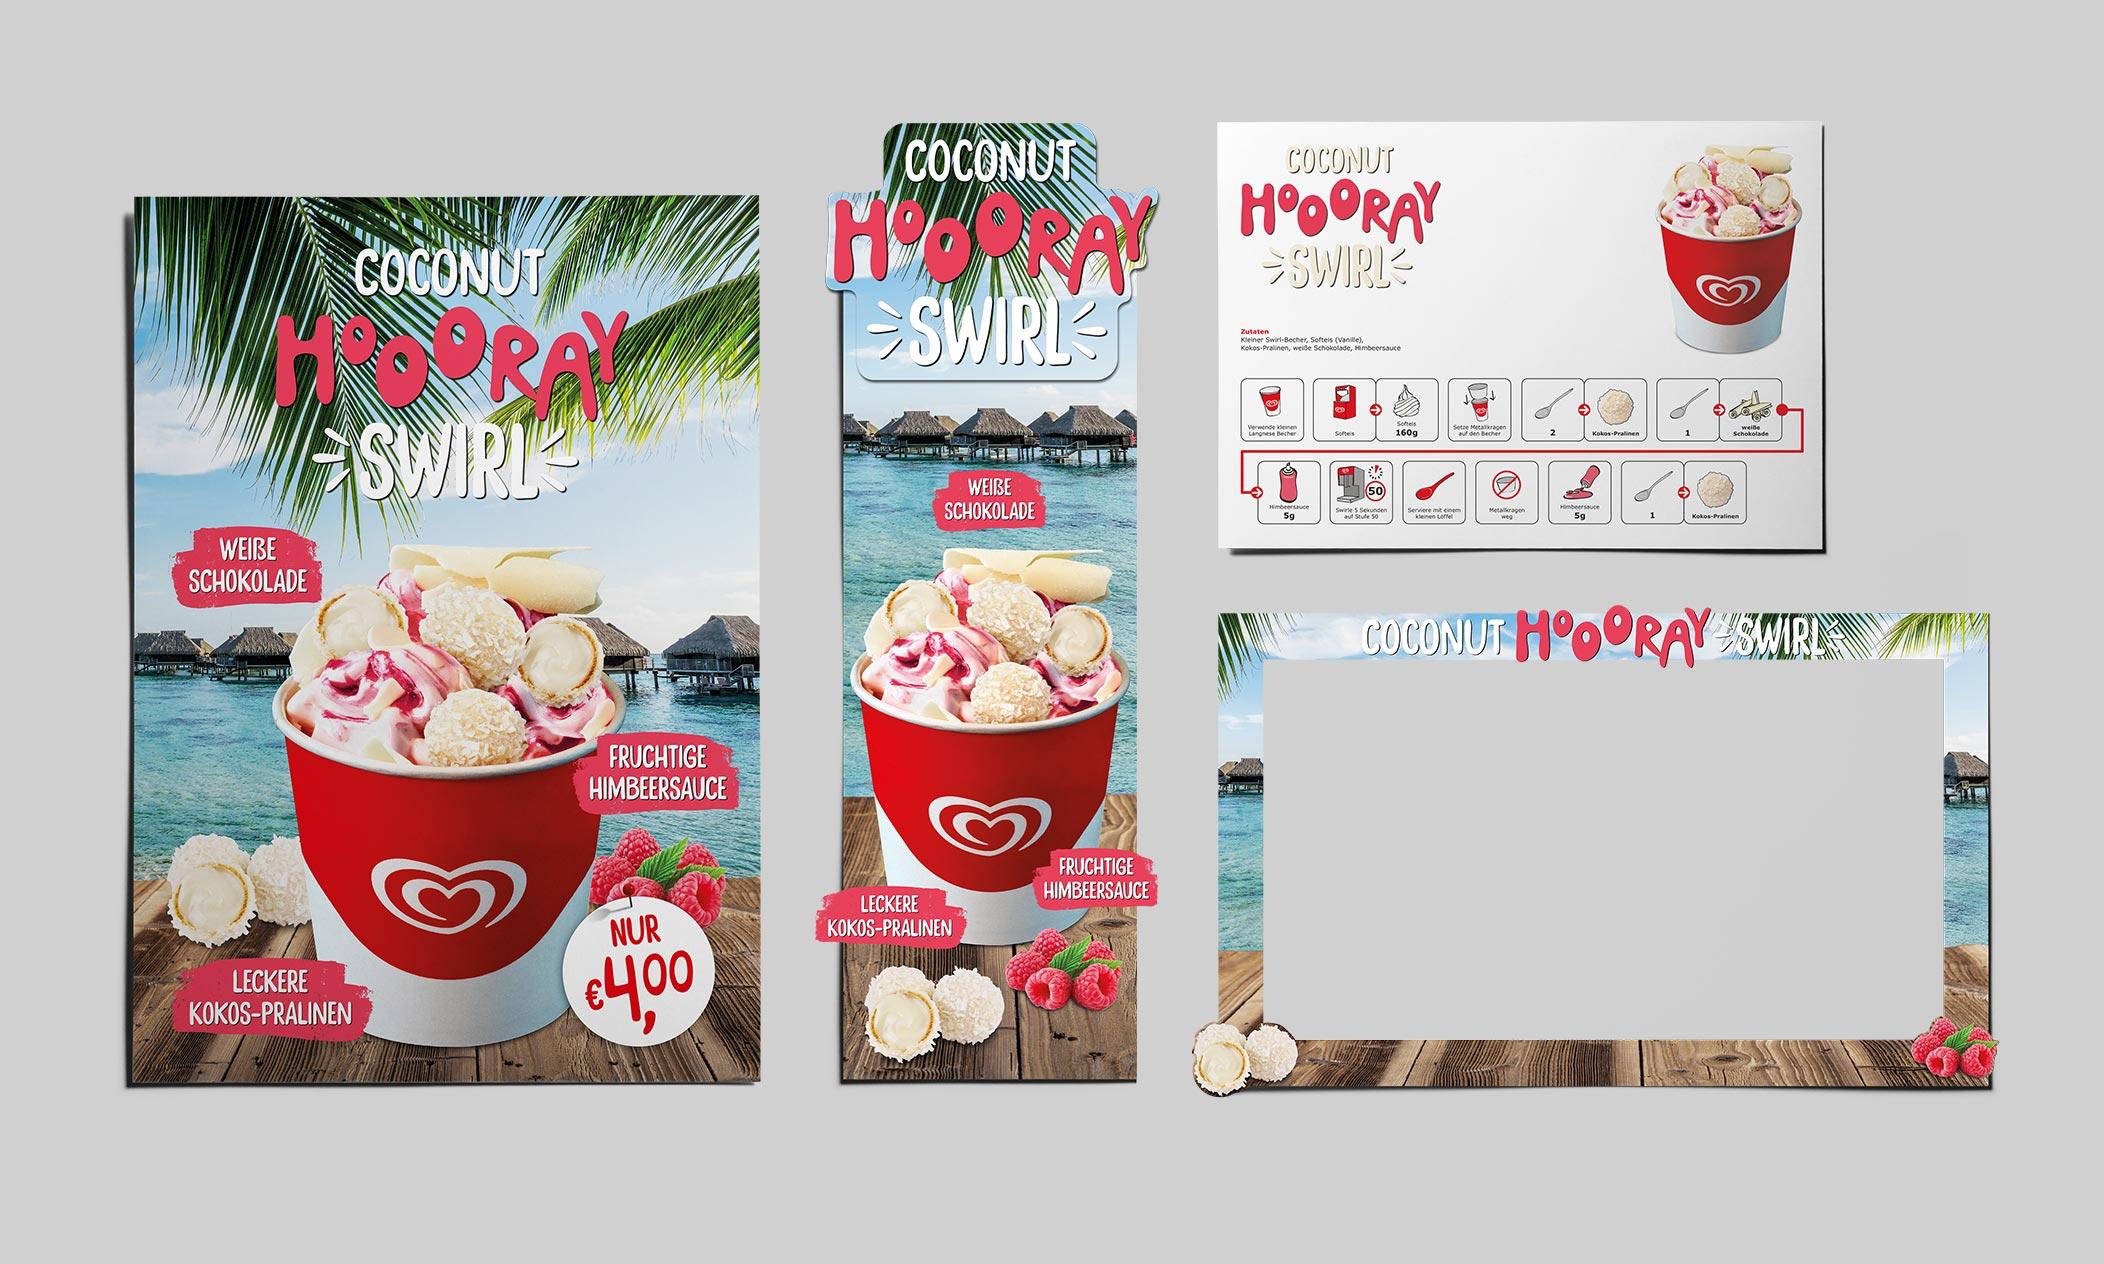 ulv_promotion_ice_cream_teamlemke_werbeagentur_aachen_2104x1264